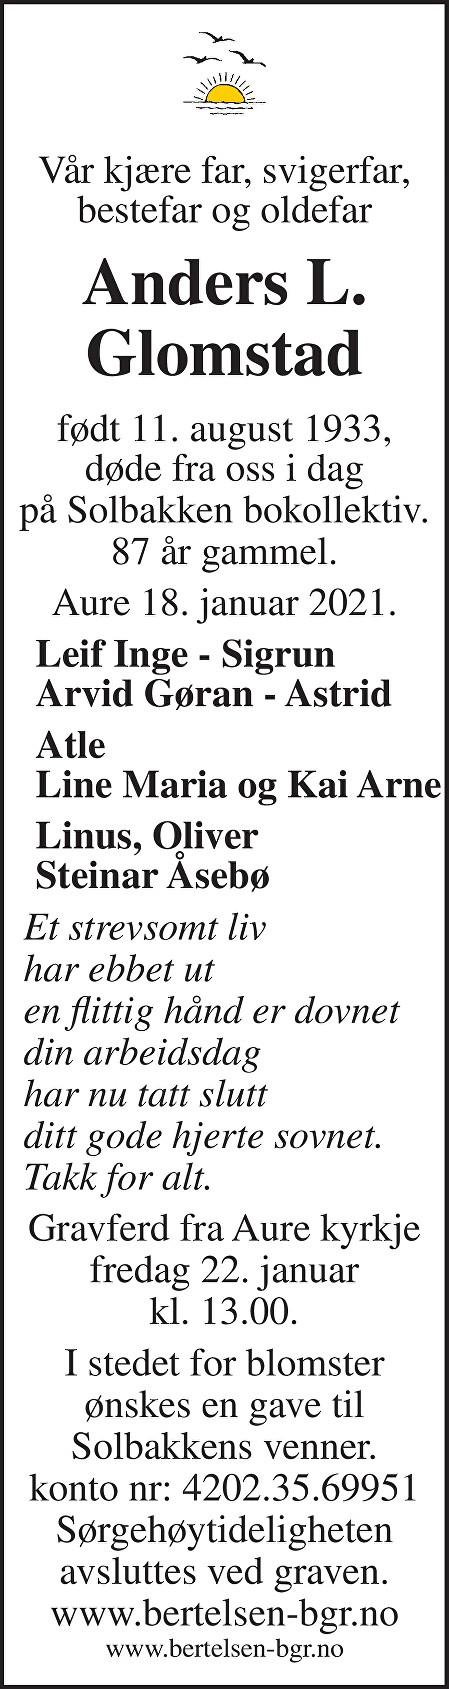 Anders L. Glomstad Dødsannonse